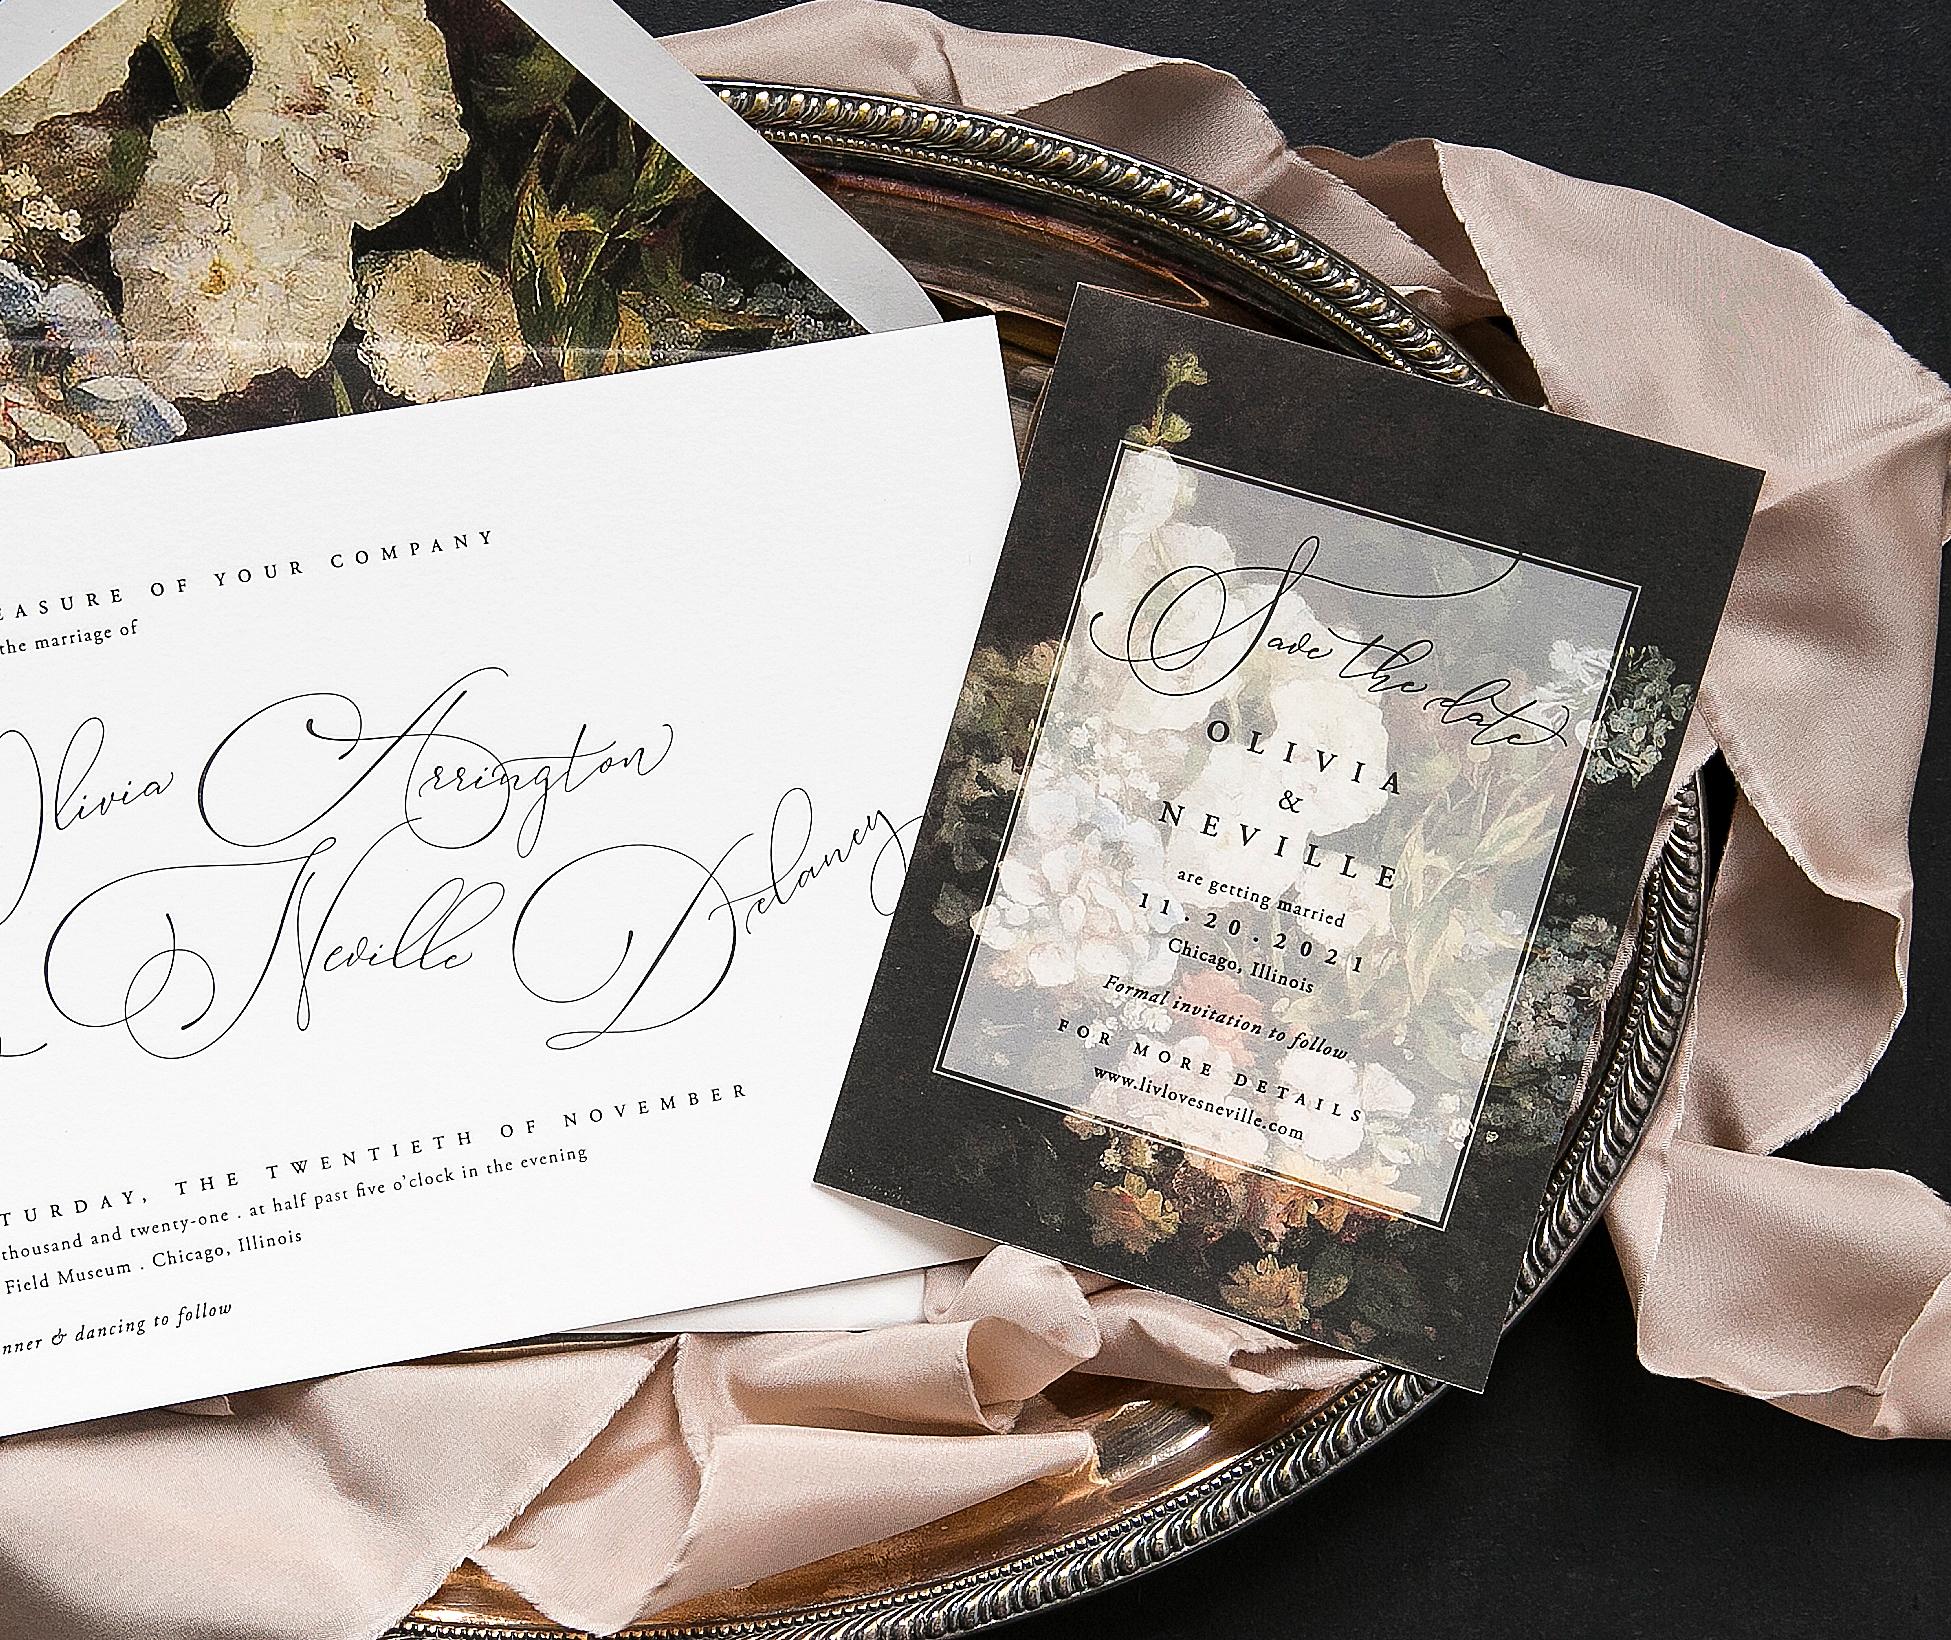 Calm Shop Save Letterpress Wedding Invitations From Bella Figura Wedding Invitation Printing Staples Wedding Invitation Printing Prices wedding invitation Wedding Invitation Printing